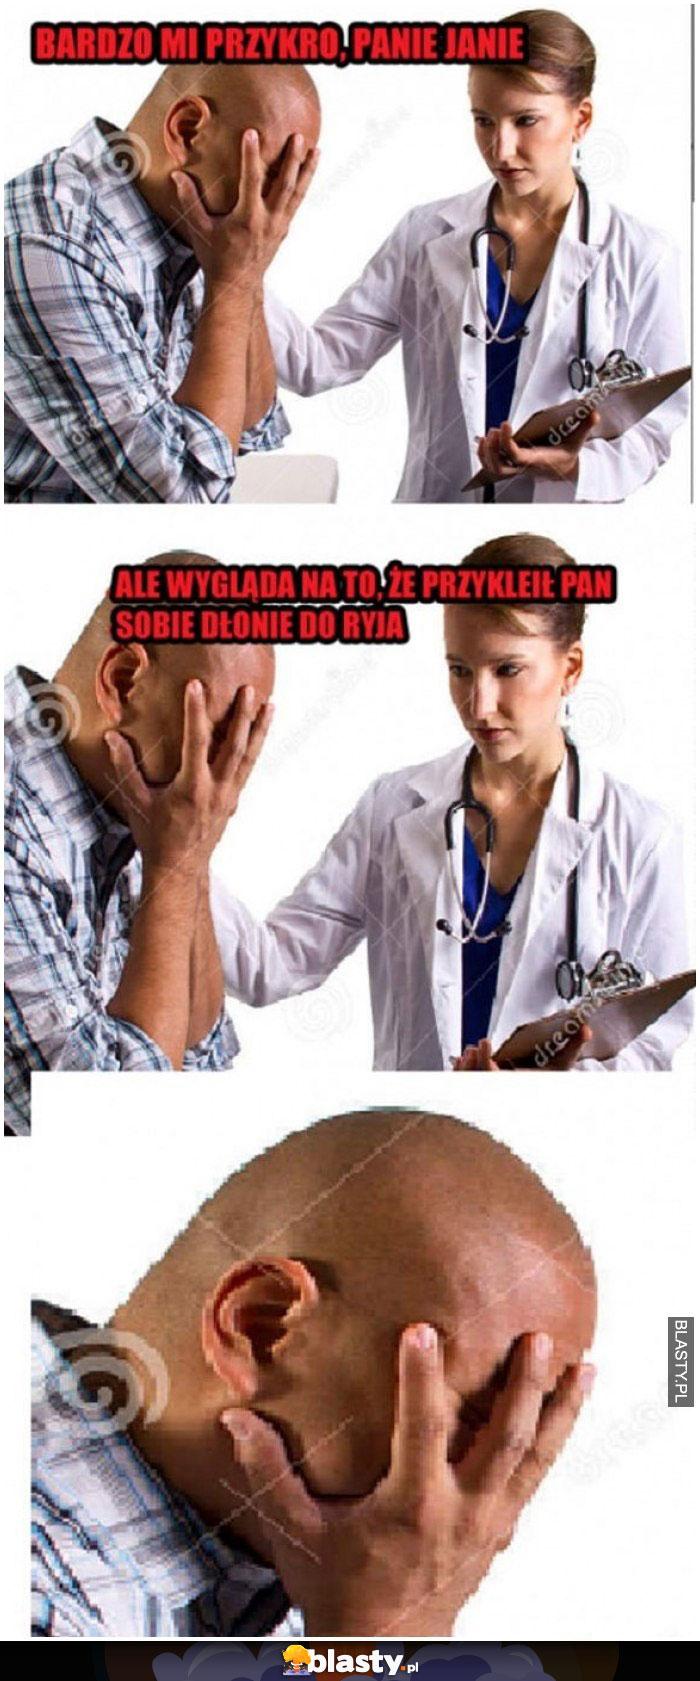 Szokująca diagnoza